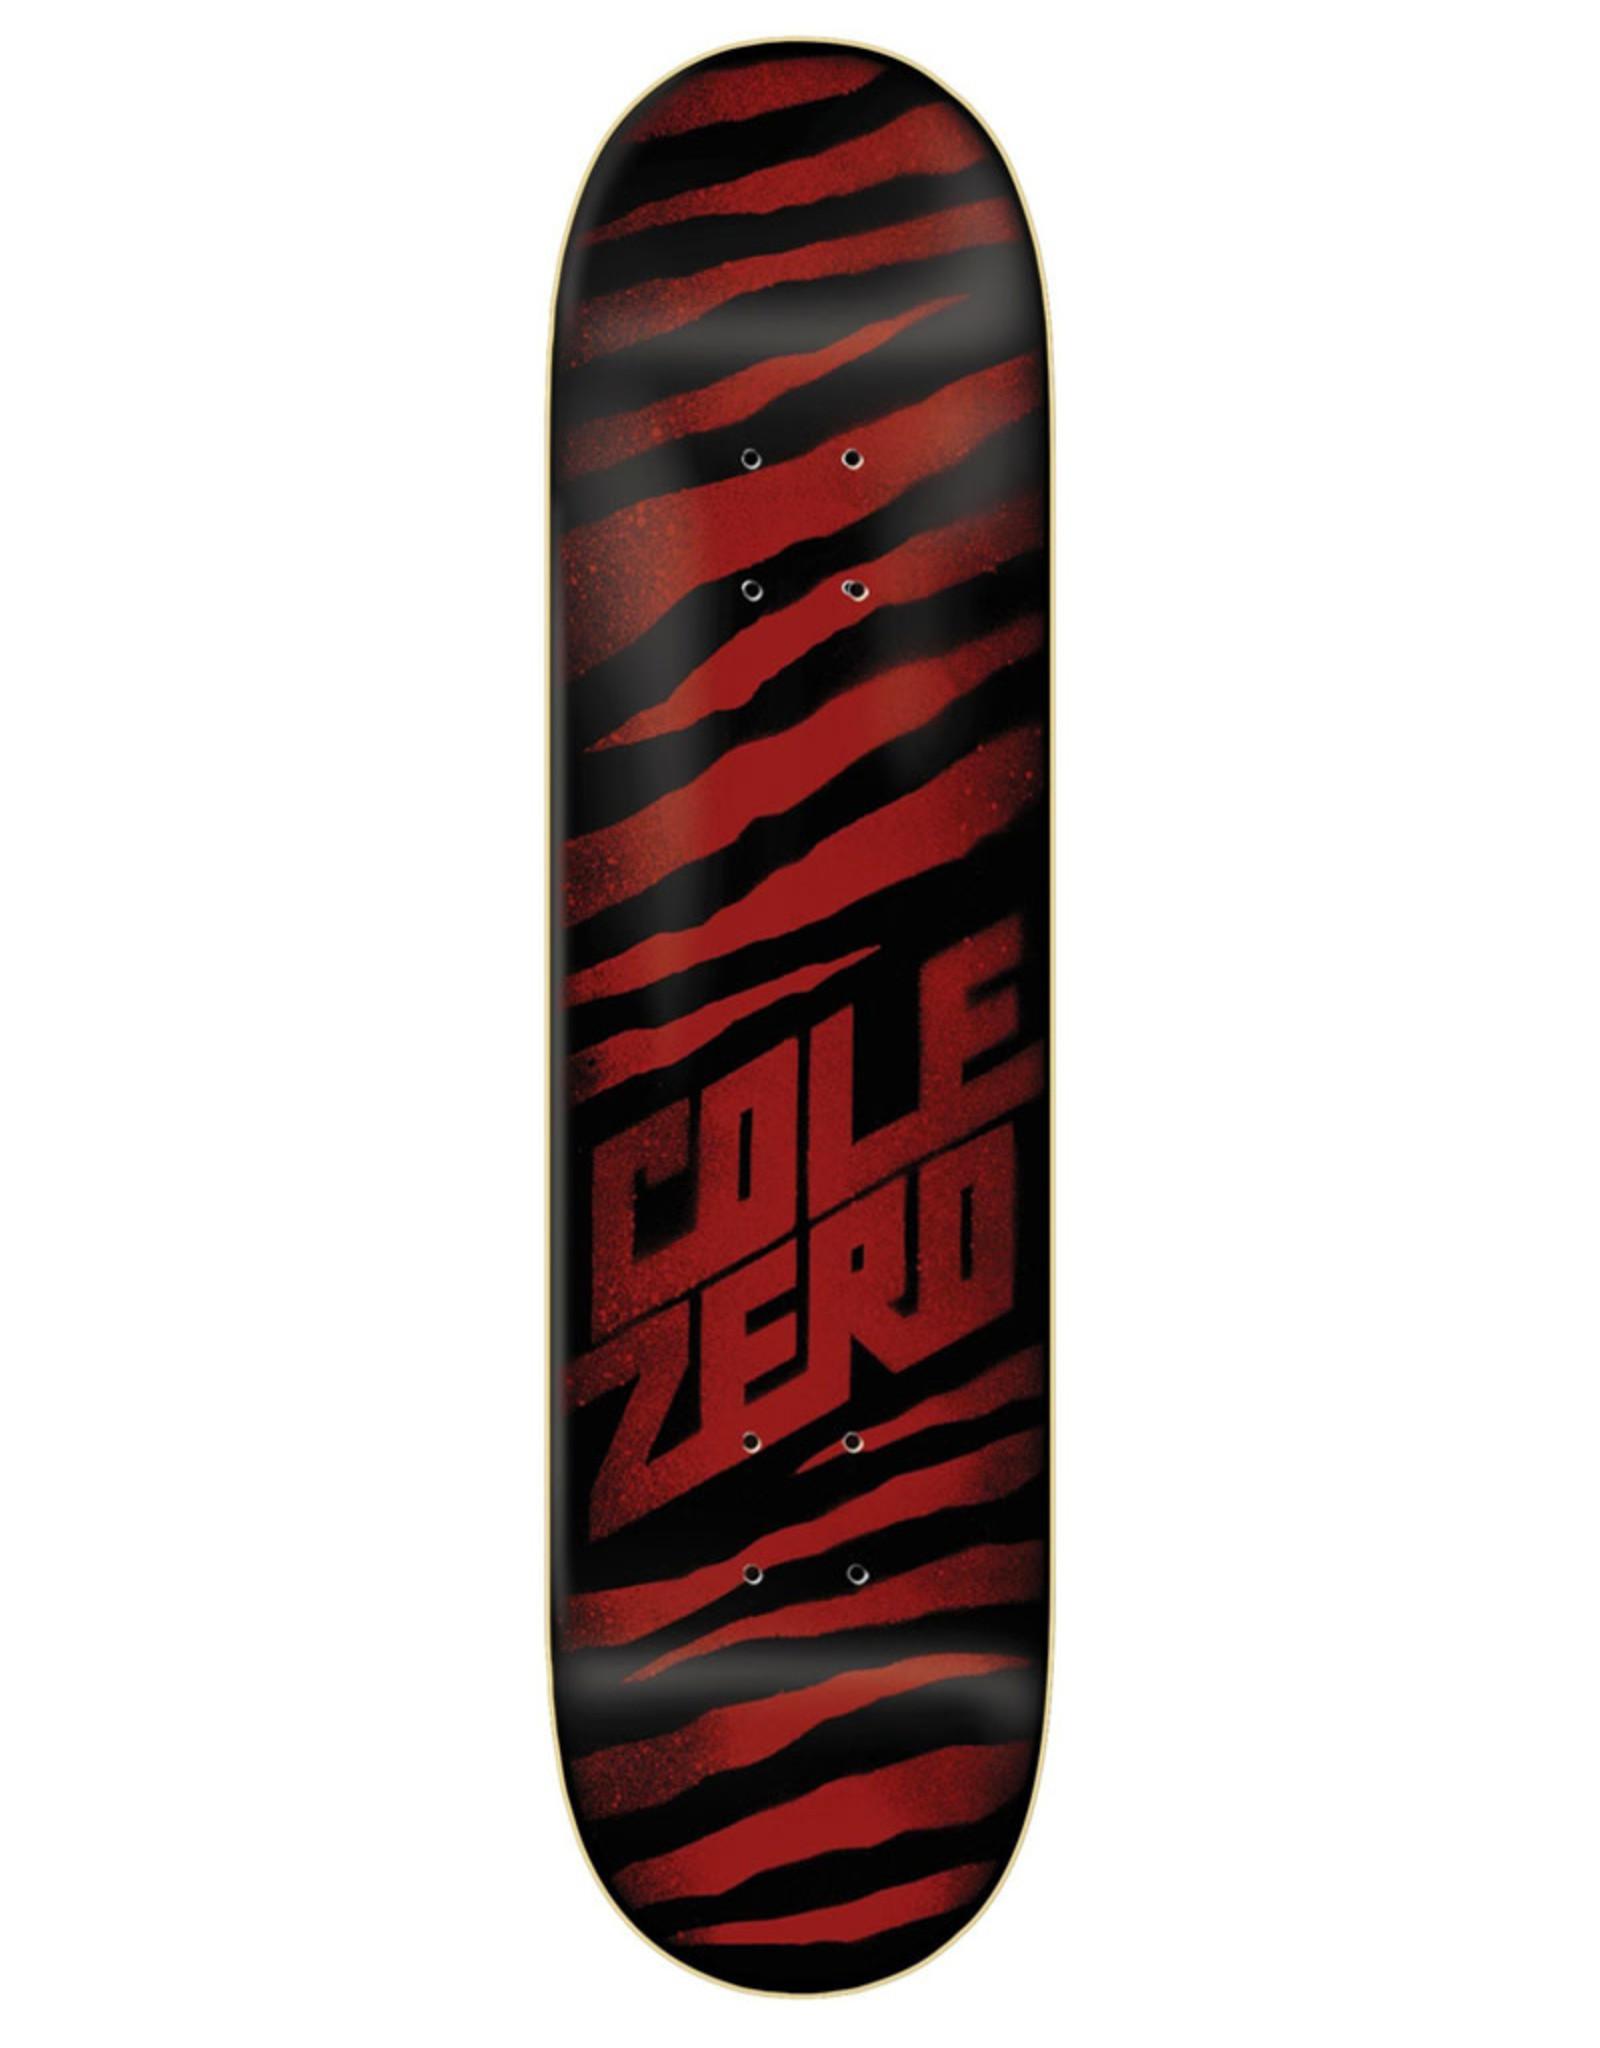 Zero Skateboards Zero Deck Chris Cole Ripper Oxblood (8.25)